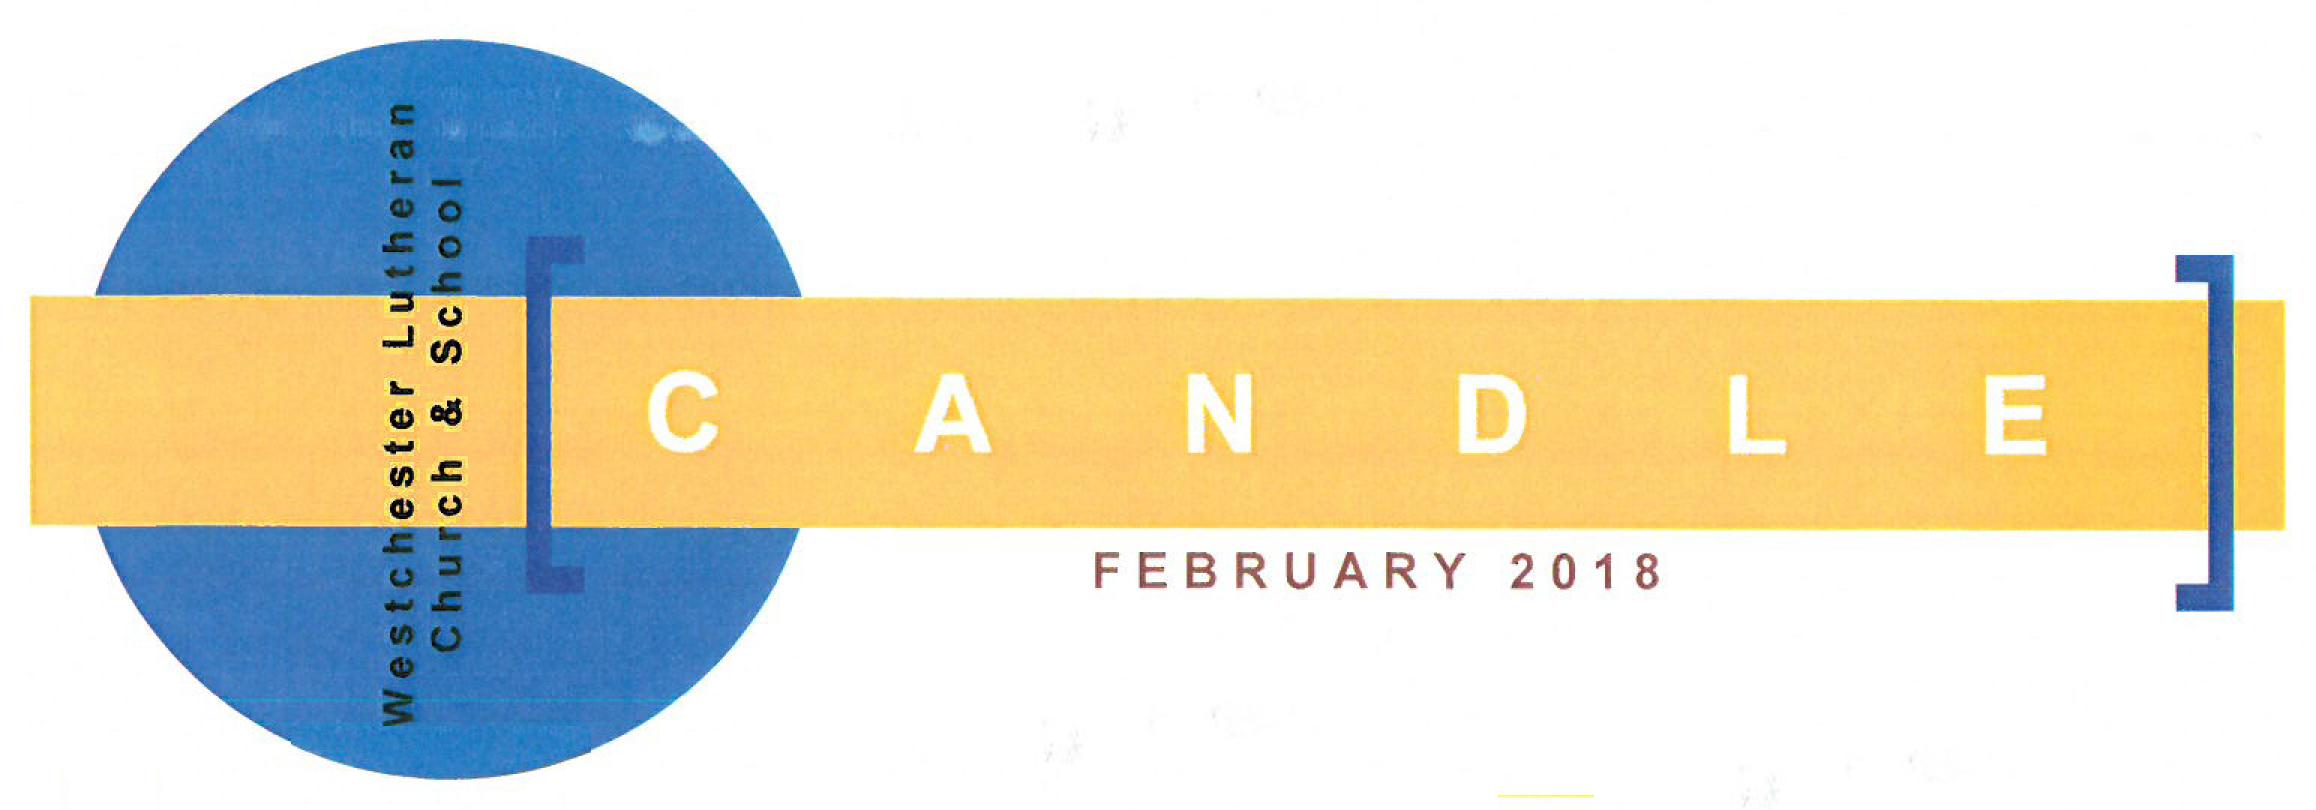 2018 February Candle- Image.jpg